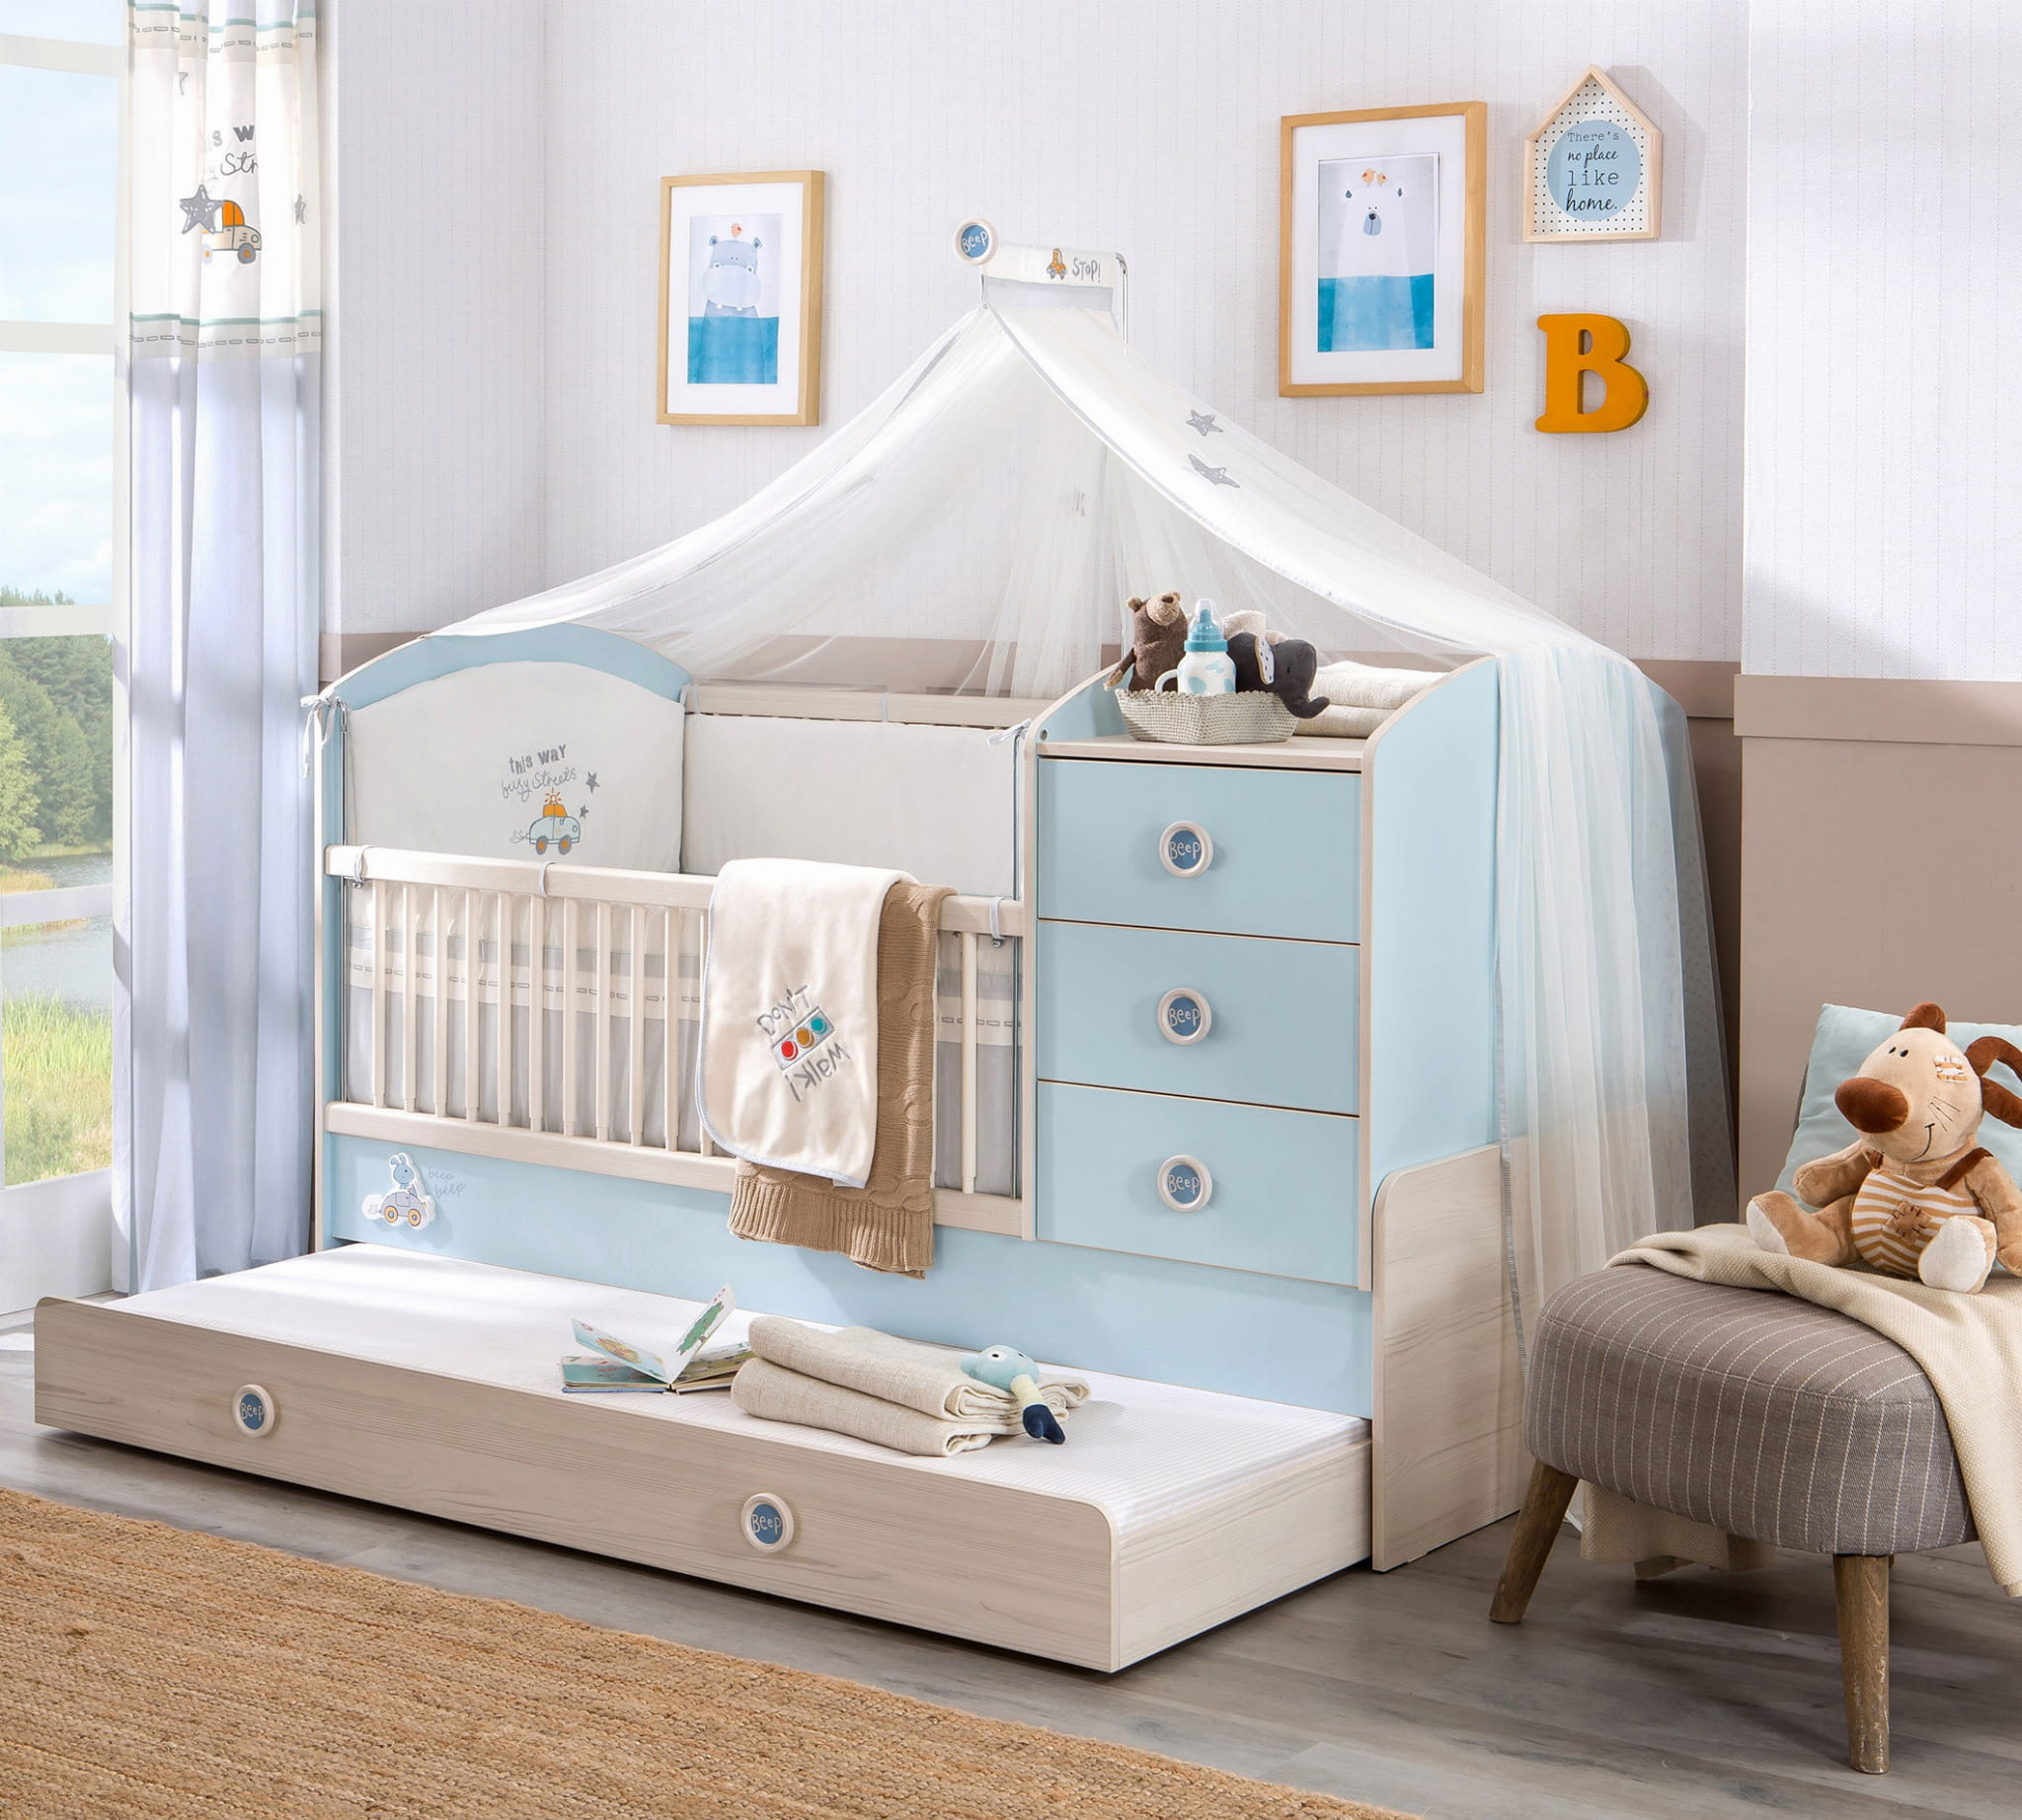 eczko dla niemowlaka babyblue 183 x 89 eleganckie meble dla dzidziusia meble kuchenne na. Black Bedroom Furniture Sets. Home Design Ideas